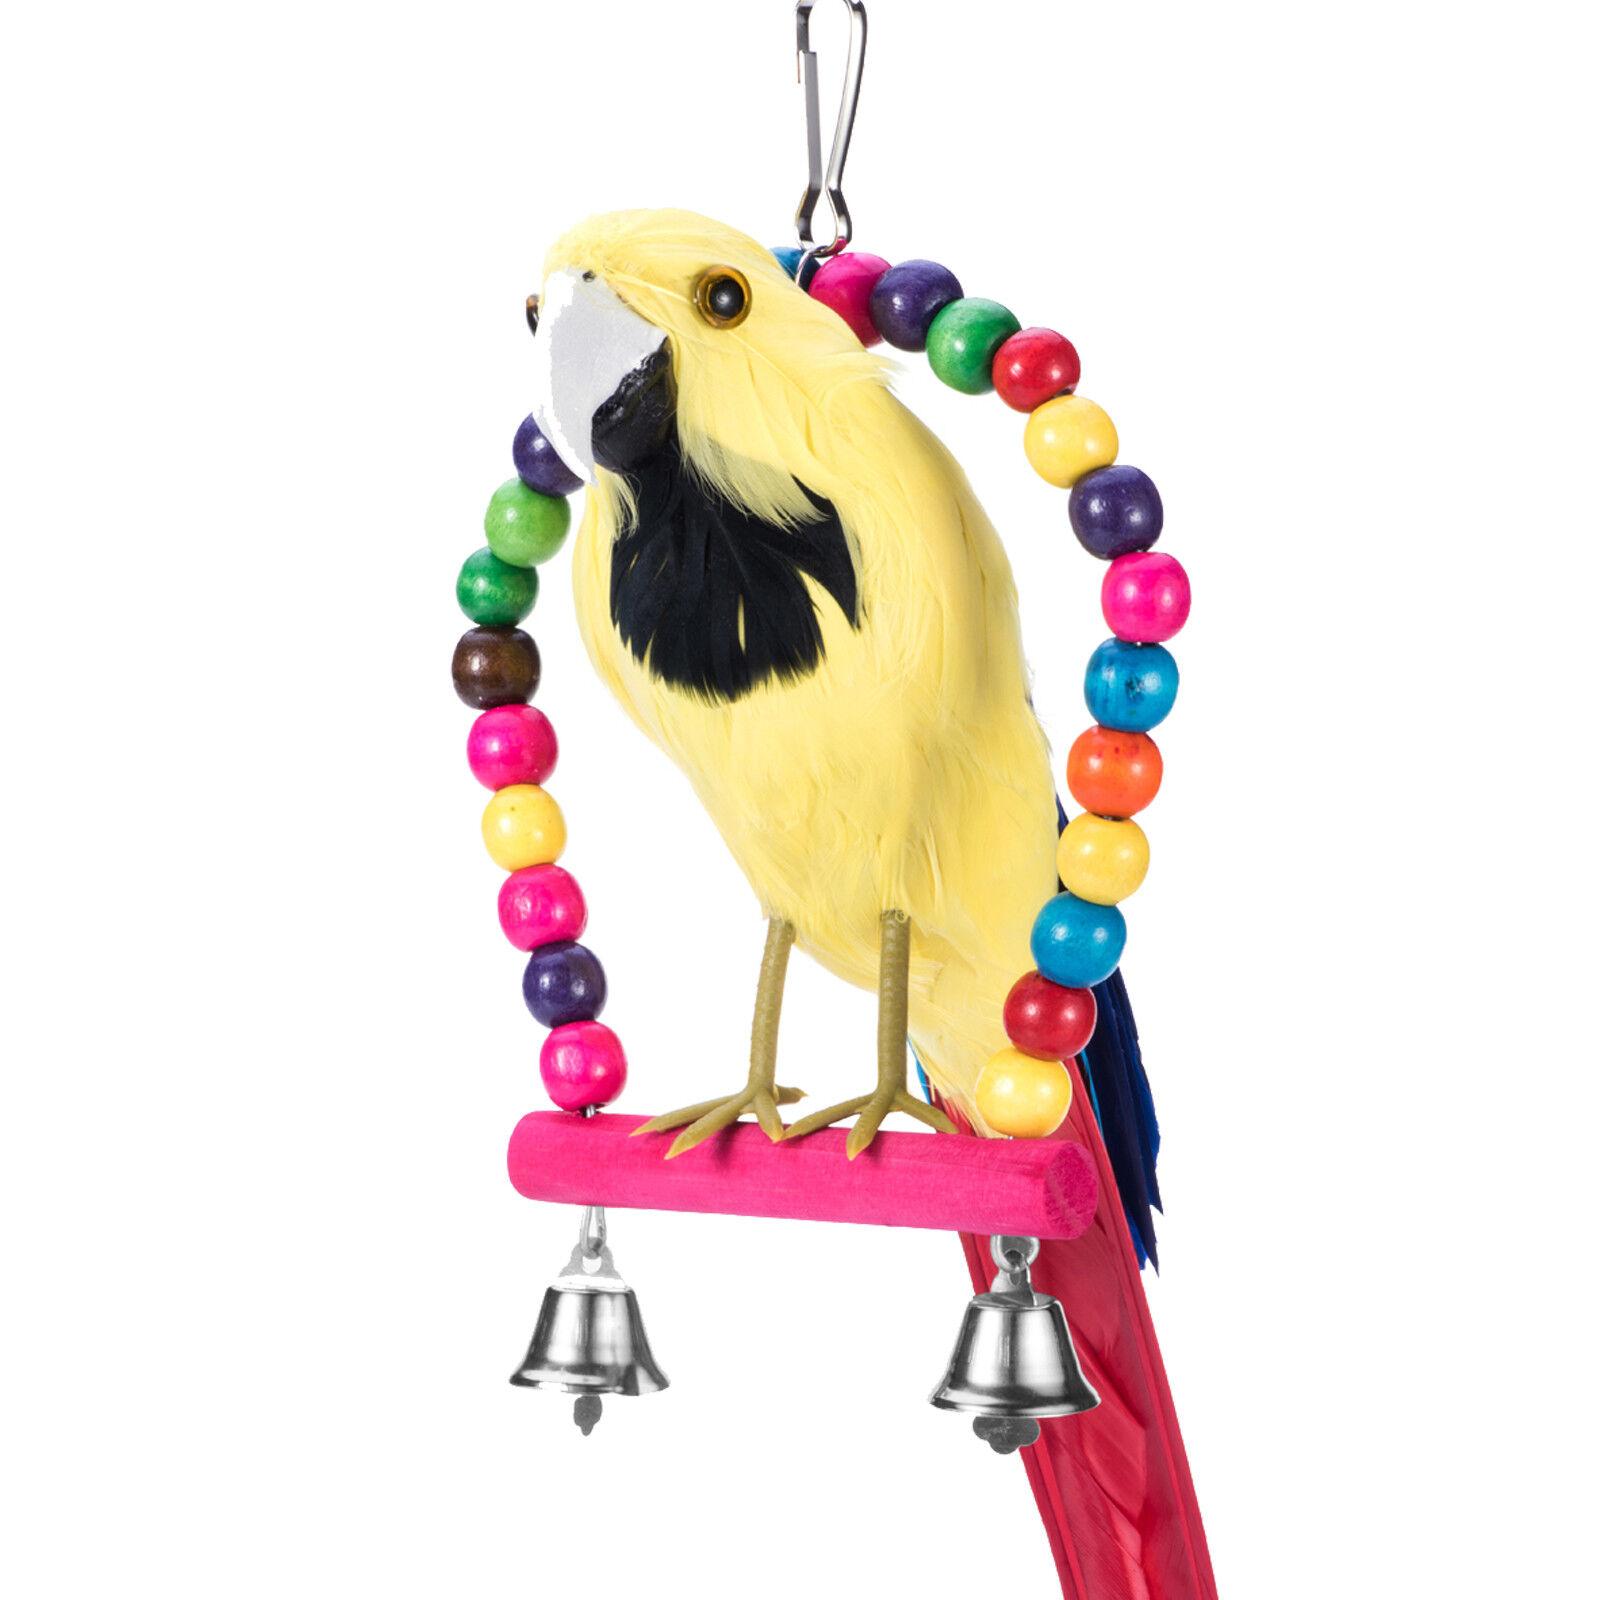 Pet Bird Swing Parrot Parakeet Budgie Cockatiel Cage Hammock Toys Hanging Toy Bird Supplies